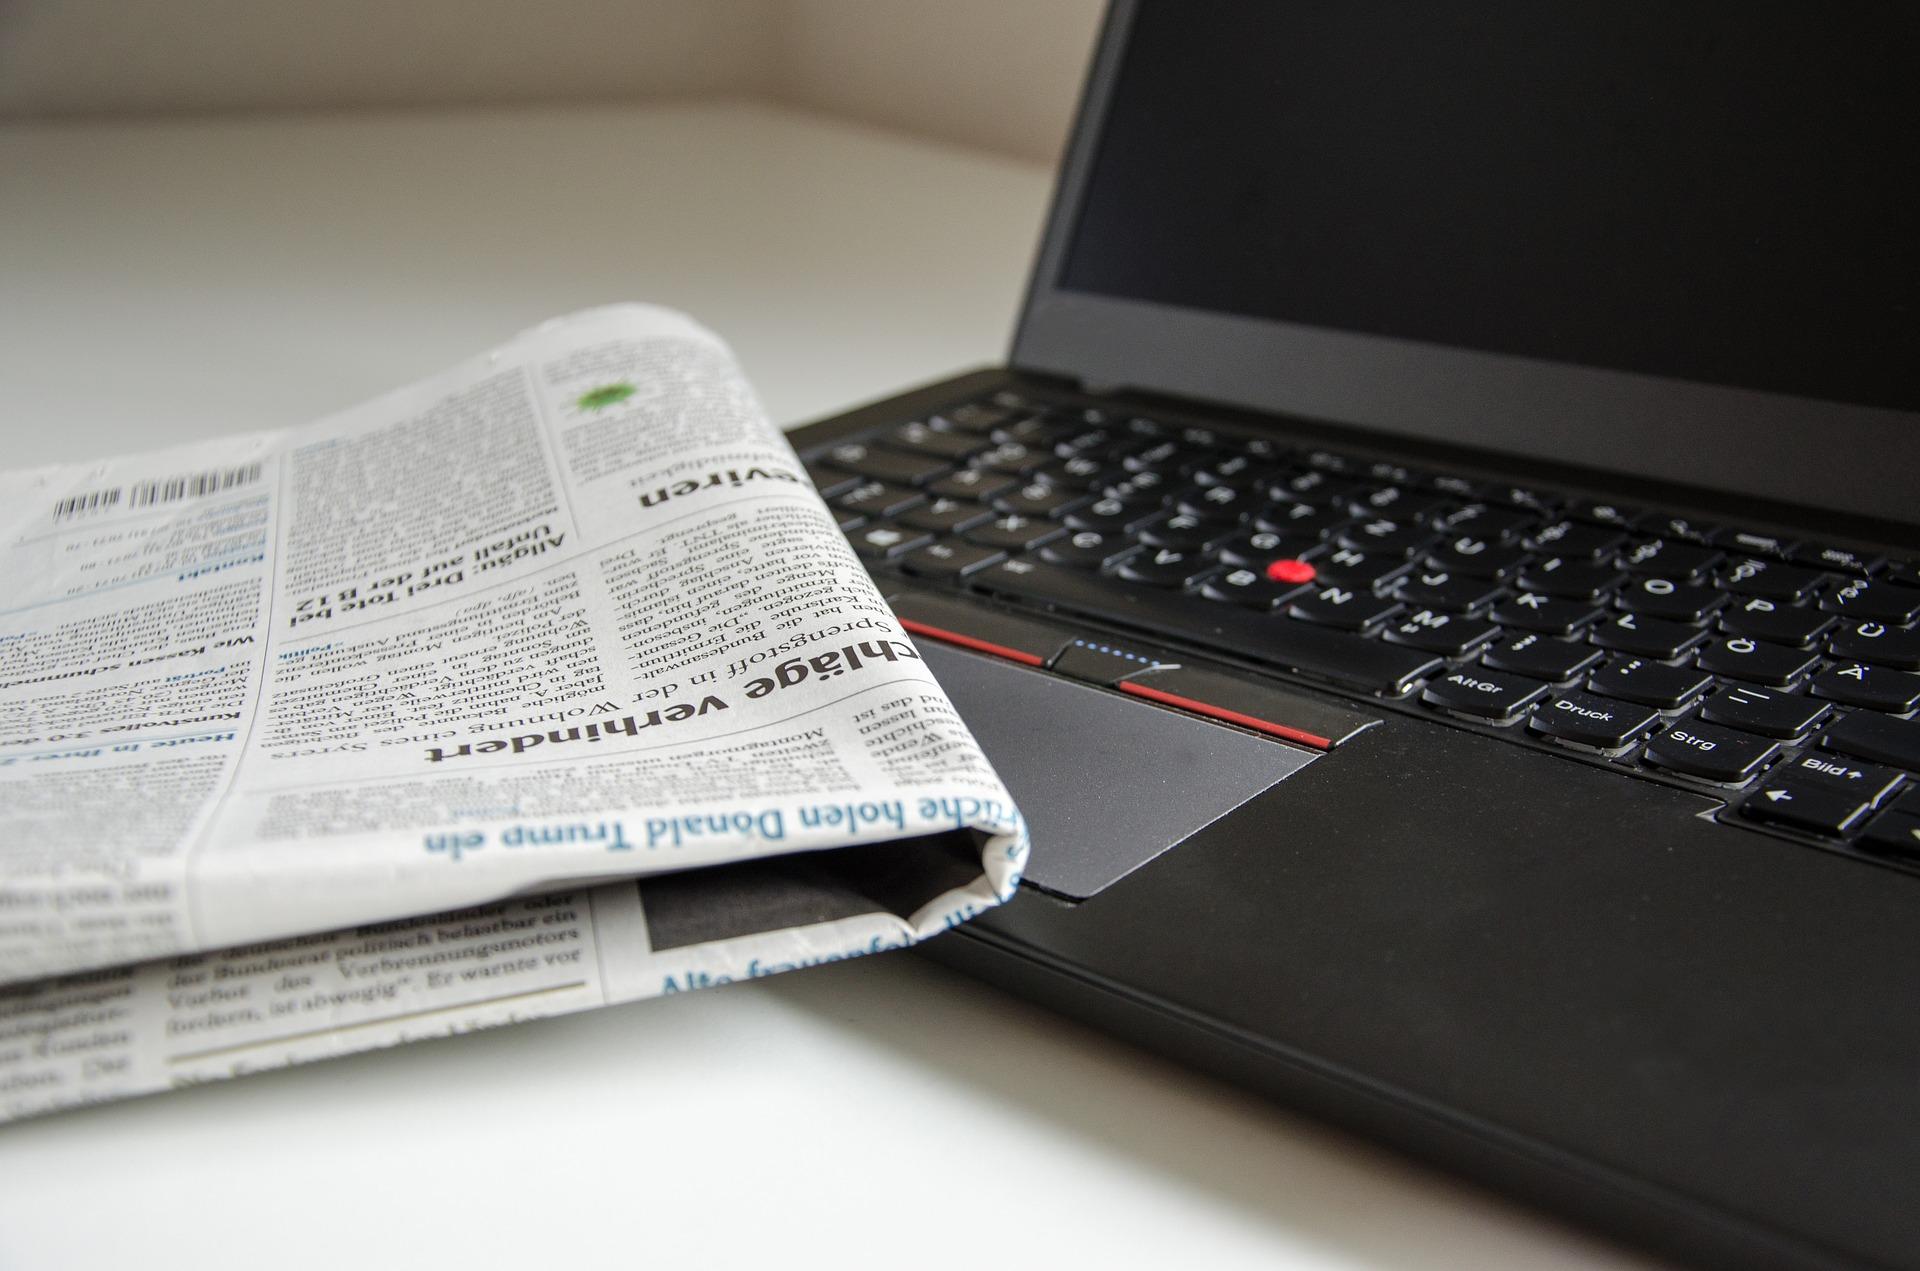 Gazeta i laptop